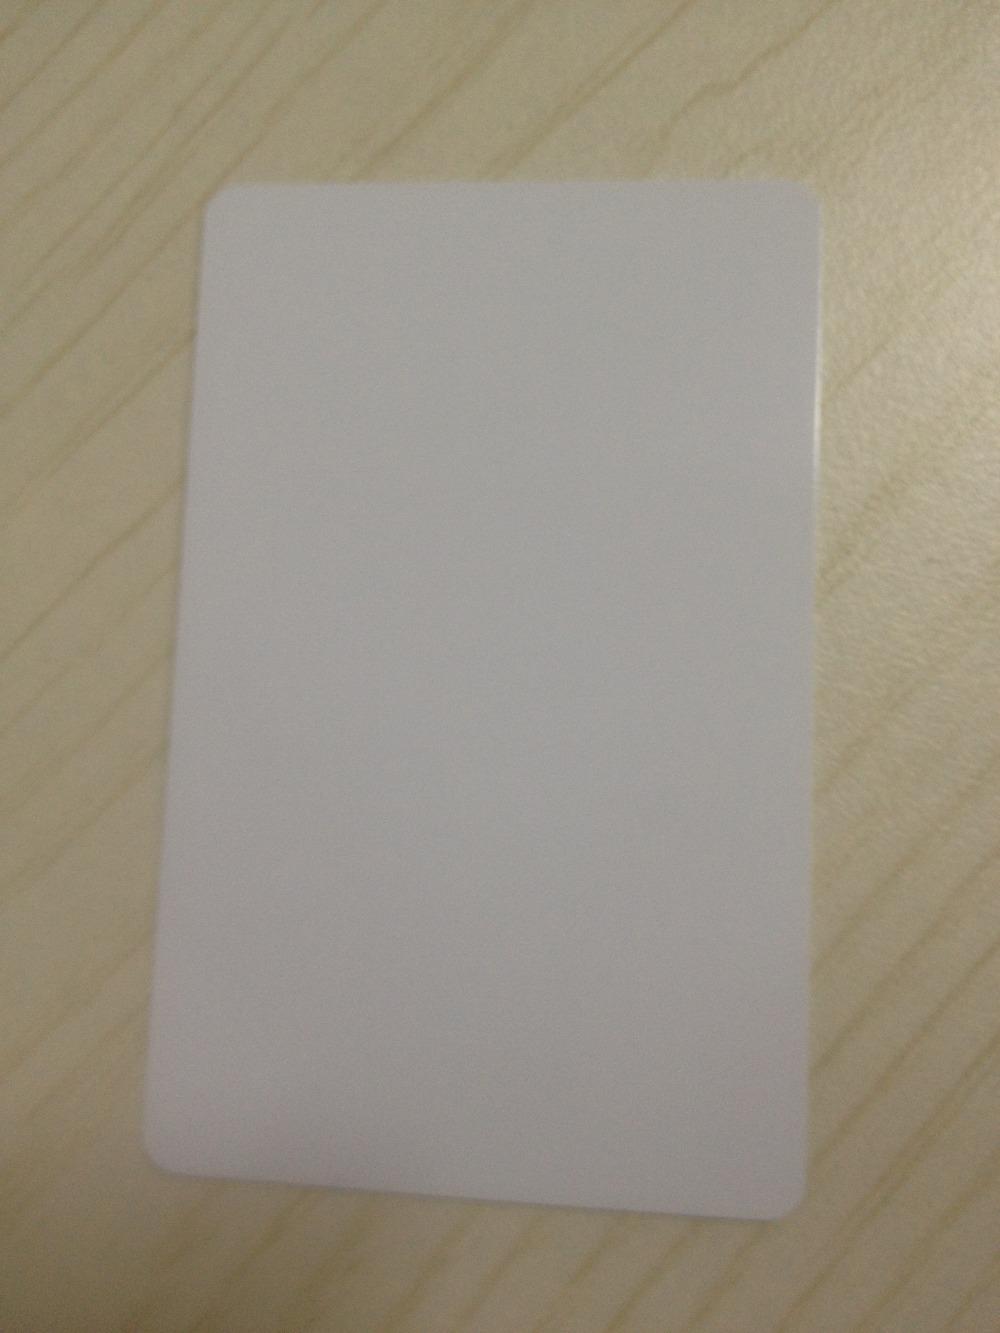 Free shipping 20pcs/lot 125khz access control clamshell card access control pvc rfid id card(ST-C06)(China (Mainland))